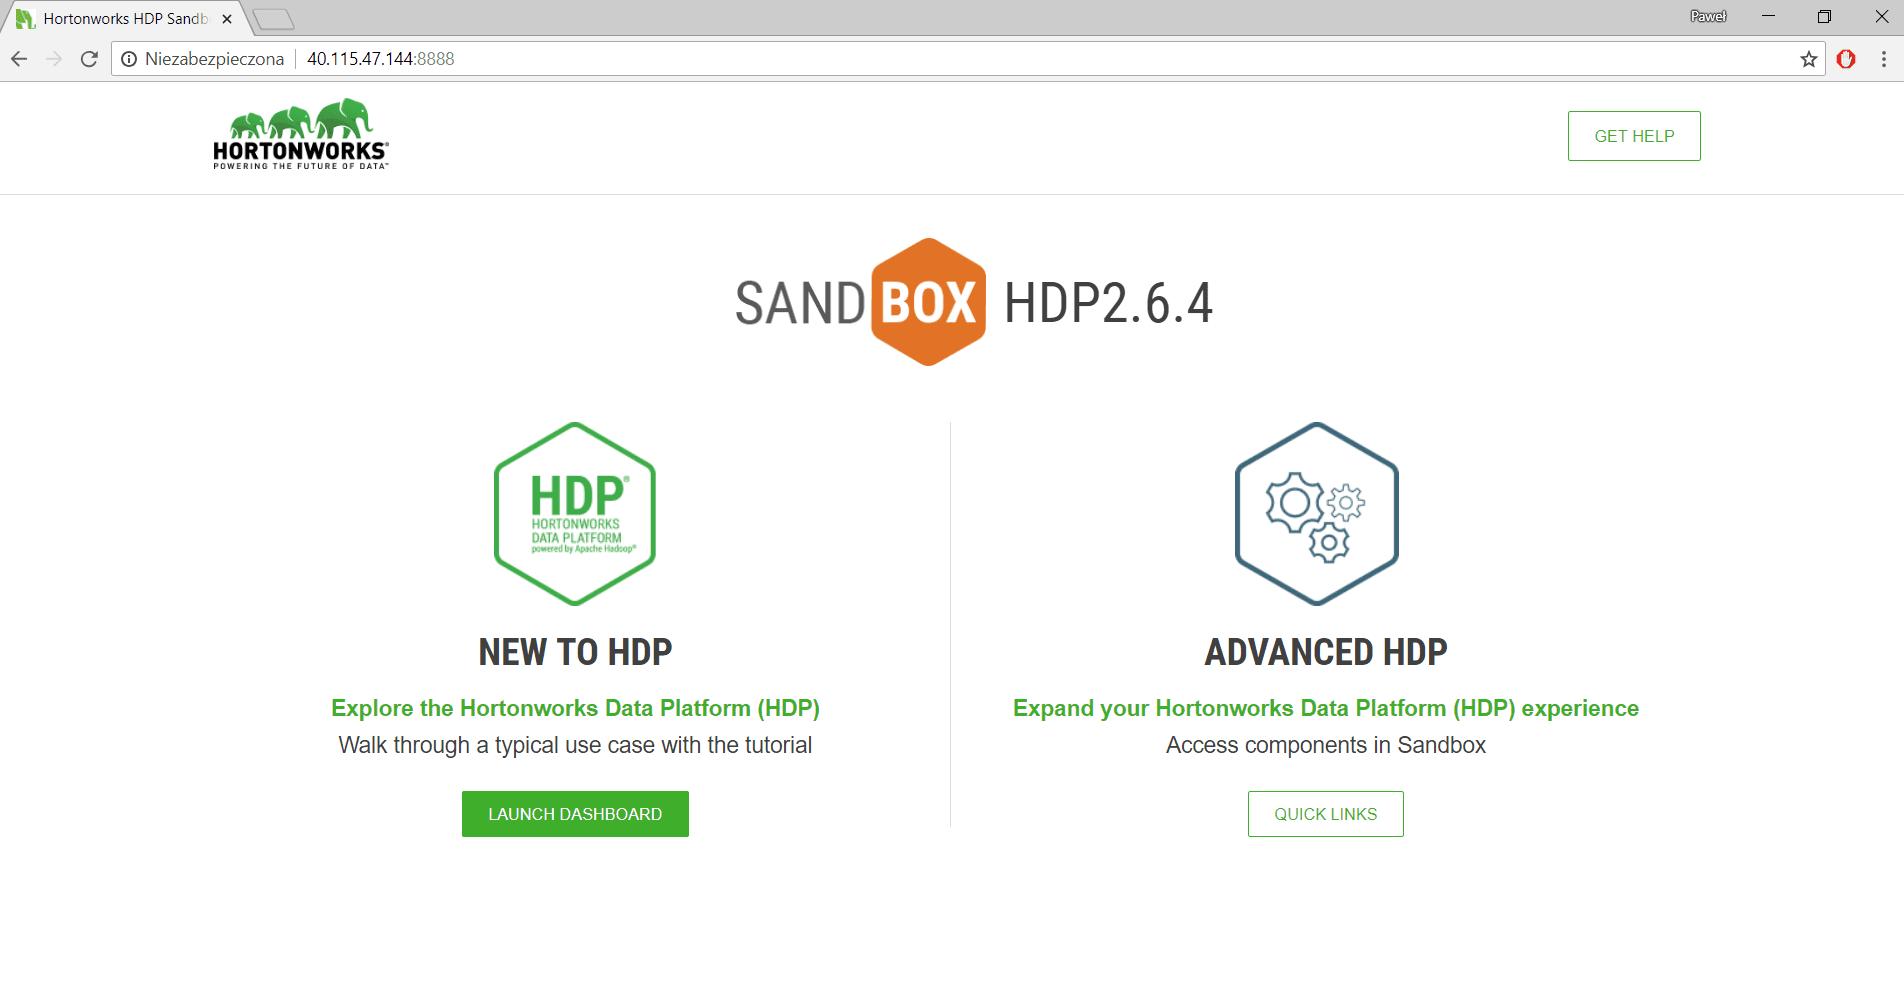 How to install Hortonworks Sandbox with Data Platform in